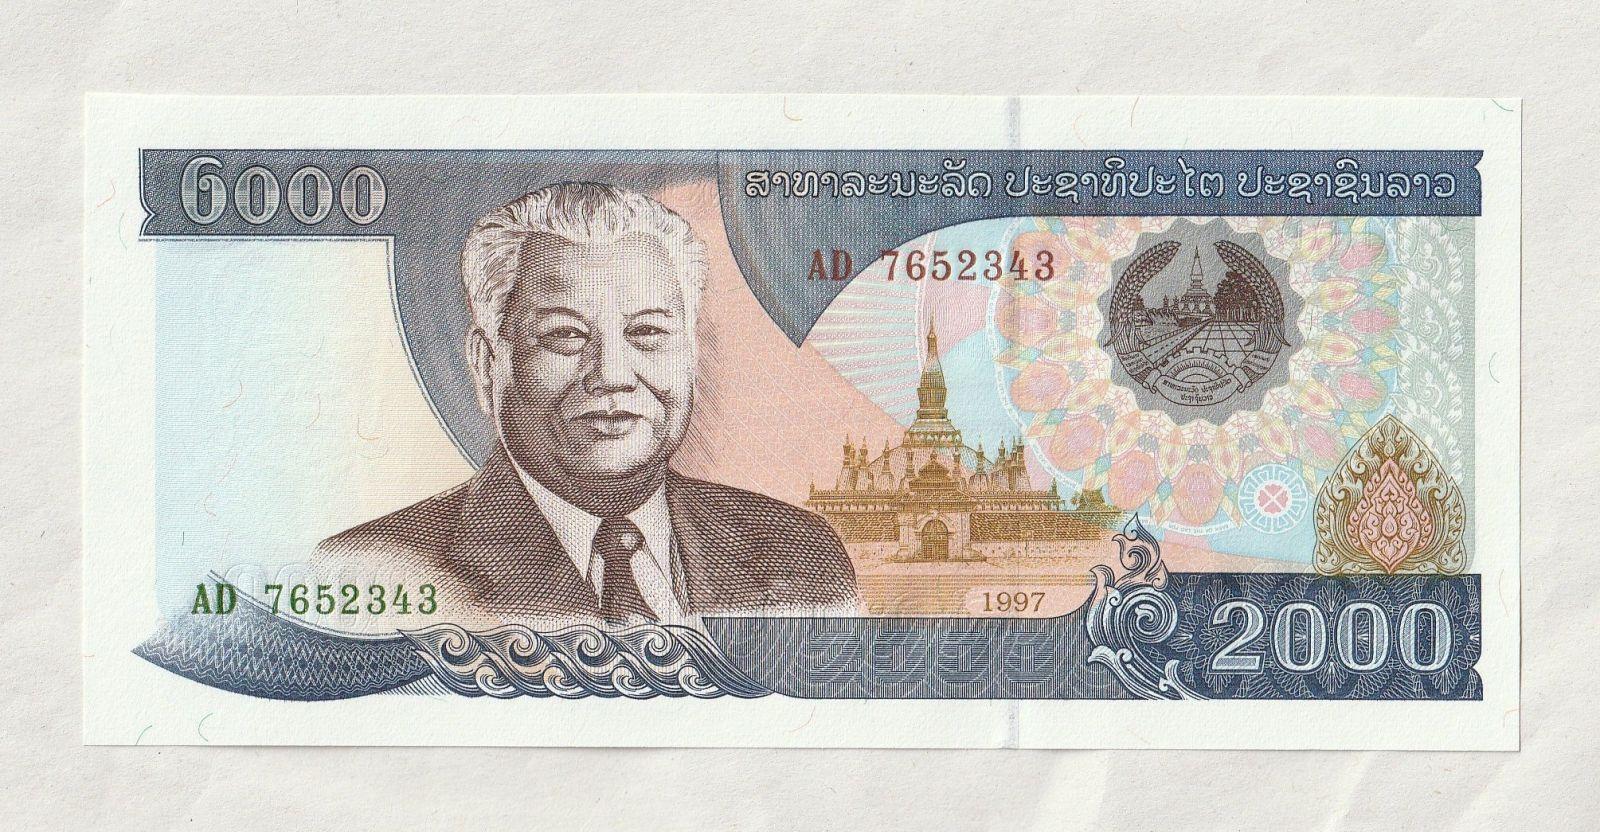 2000 Kip, 1997, Laos